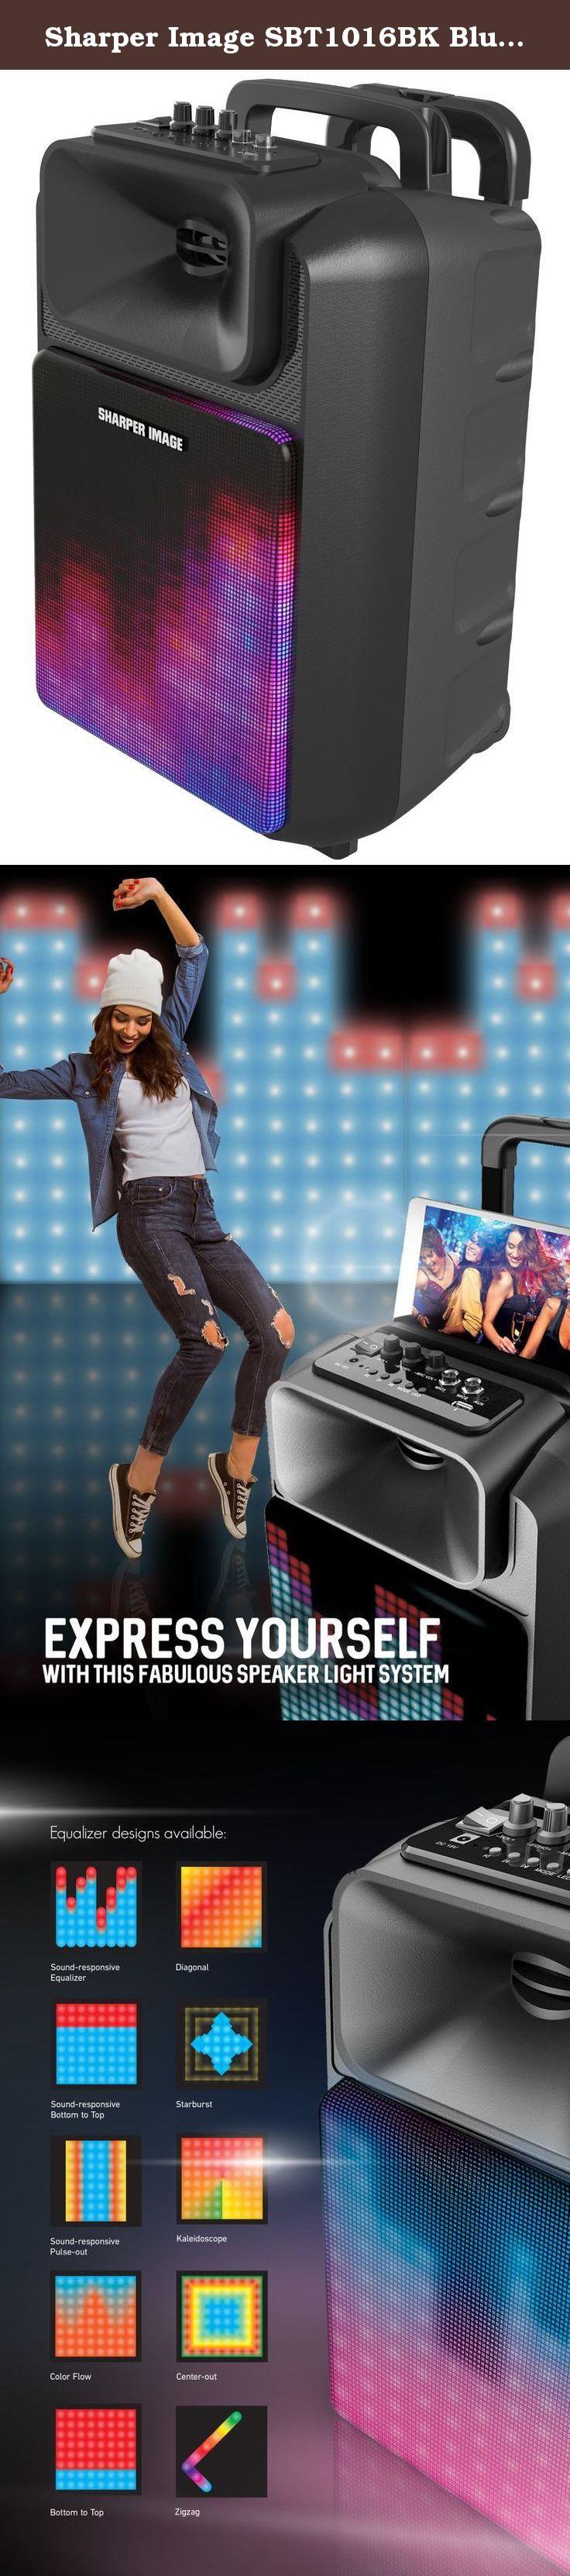 Sharper Image Sbt1016bk Bluetooth Wireless Portable Tailgate Speaker